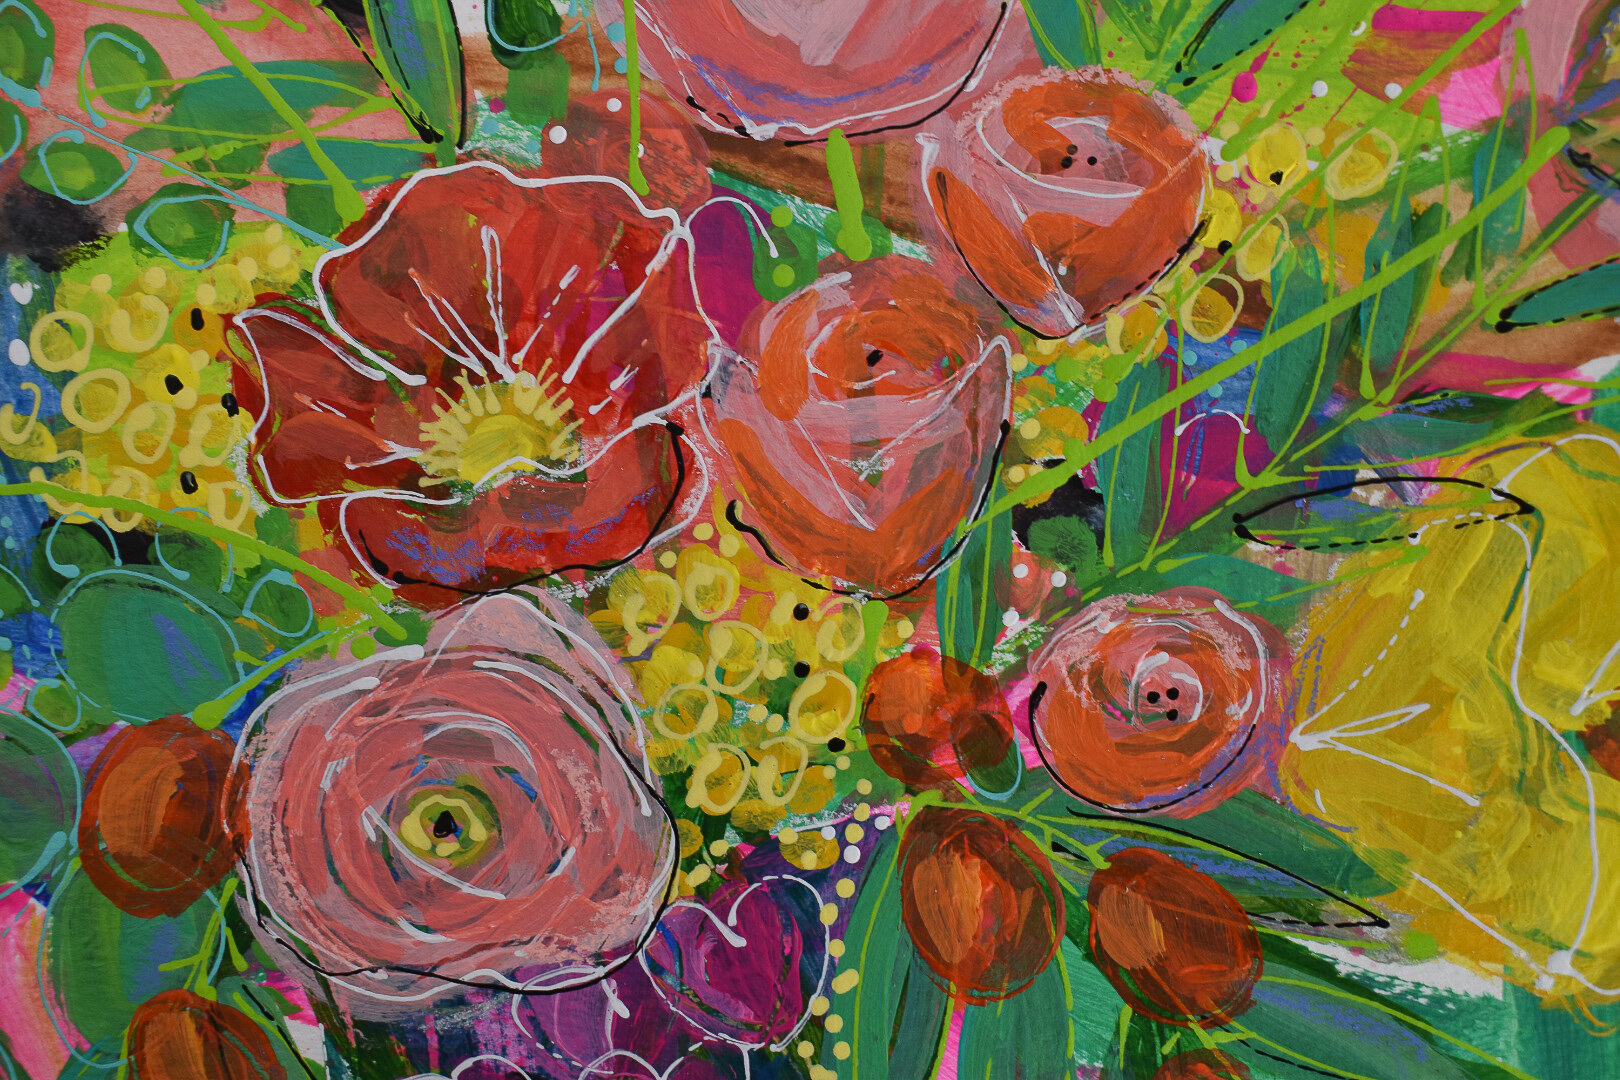 boho_flowers_painting_eclectic_tropical_daisyfaithart_6.jpg